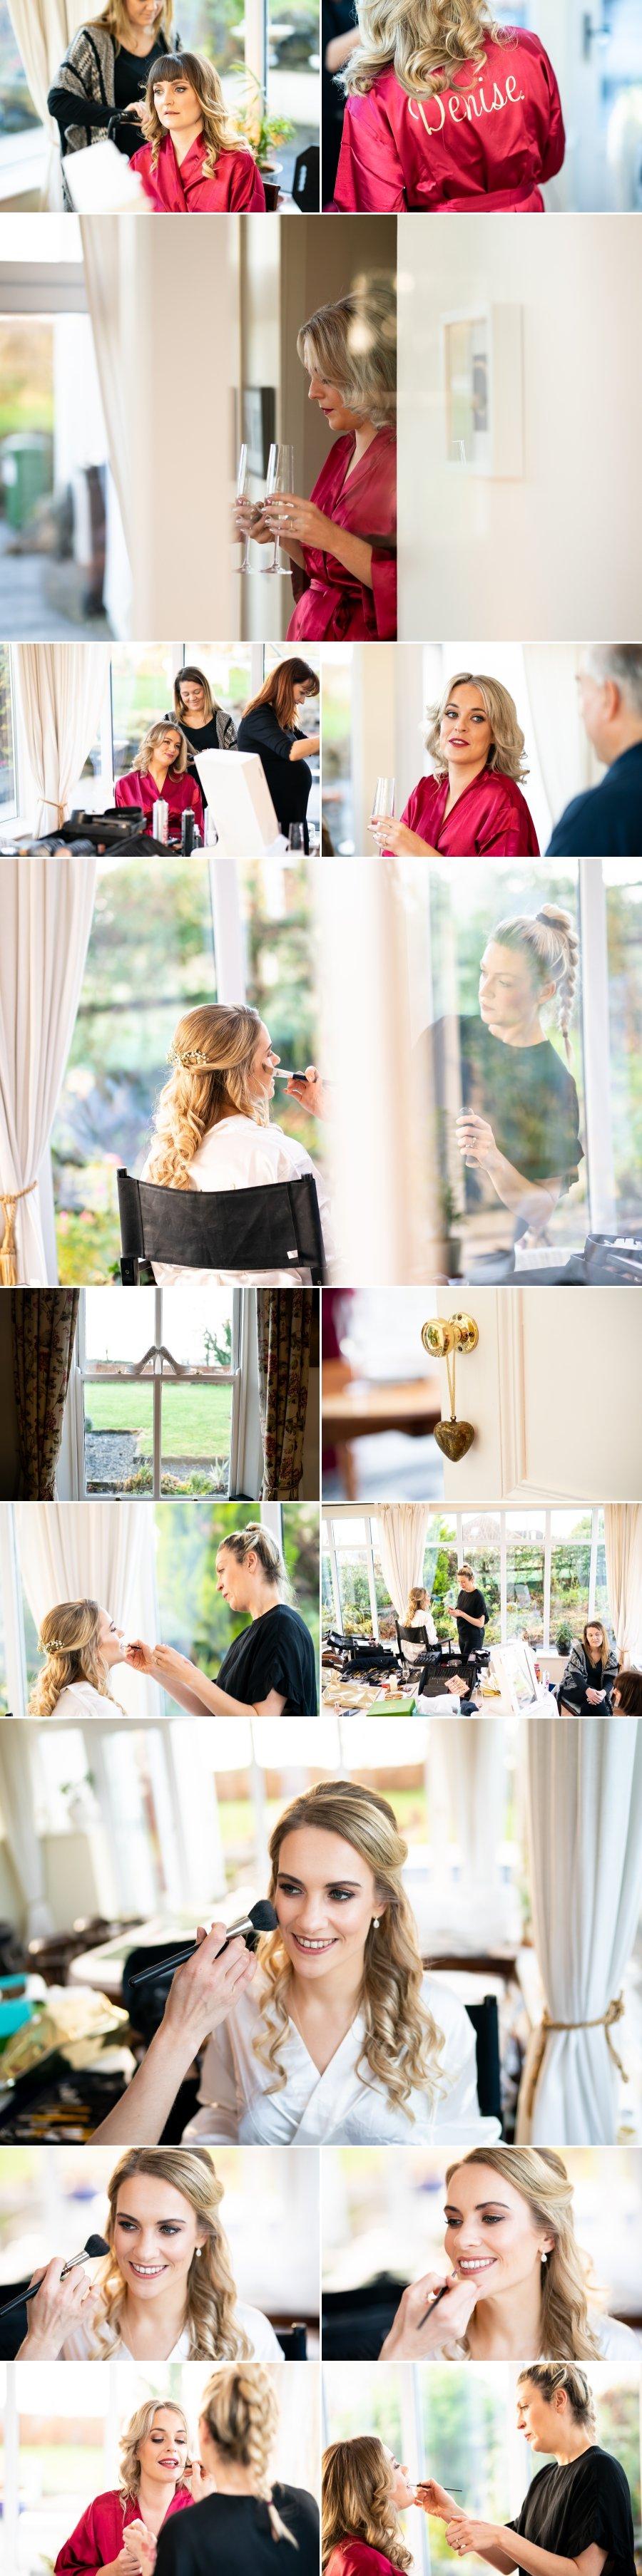 Markree Castle Sligo Wedding bride getting hair and makeup done